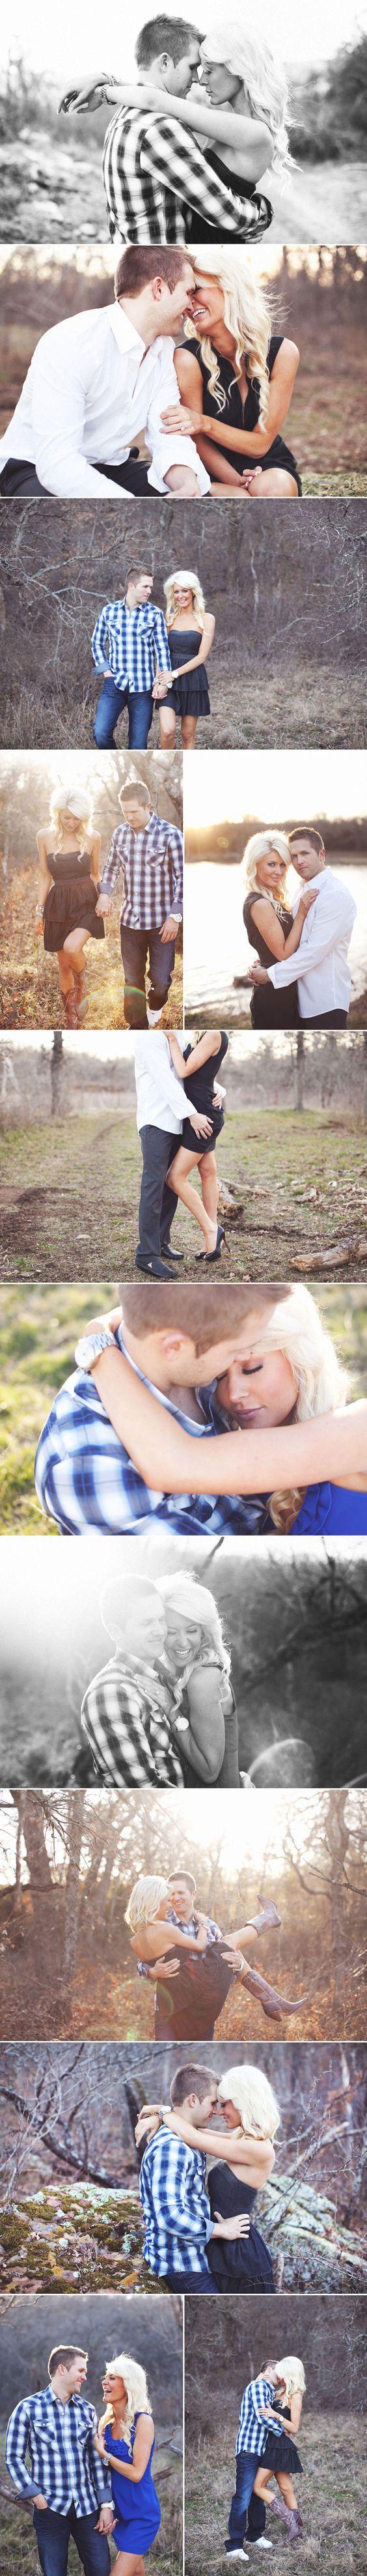 Love these photos.